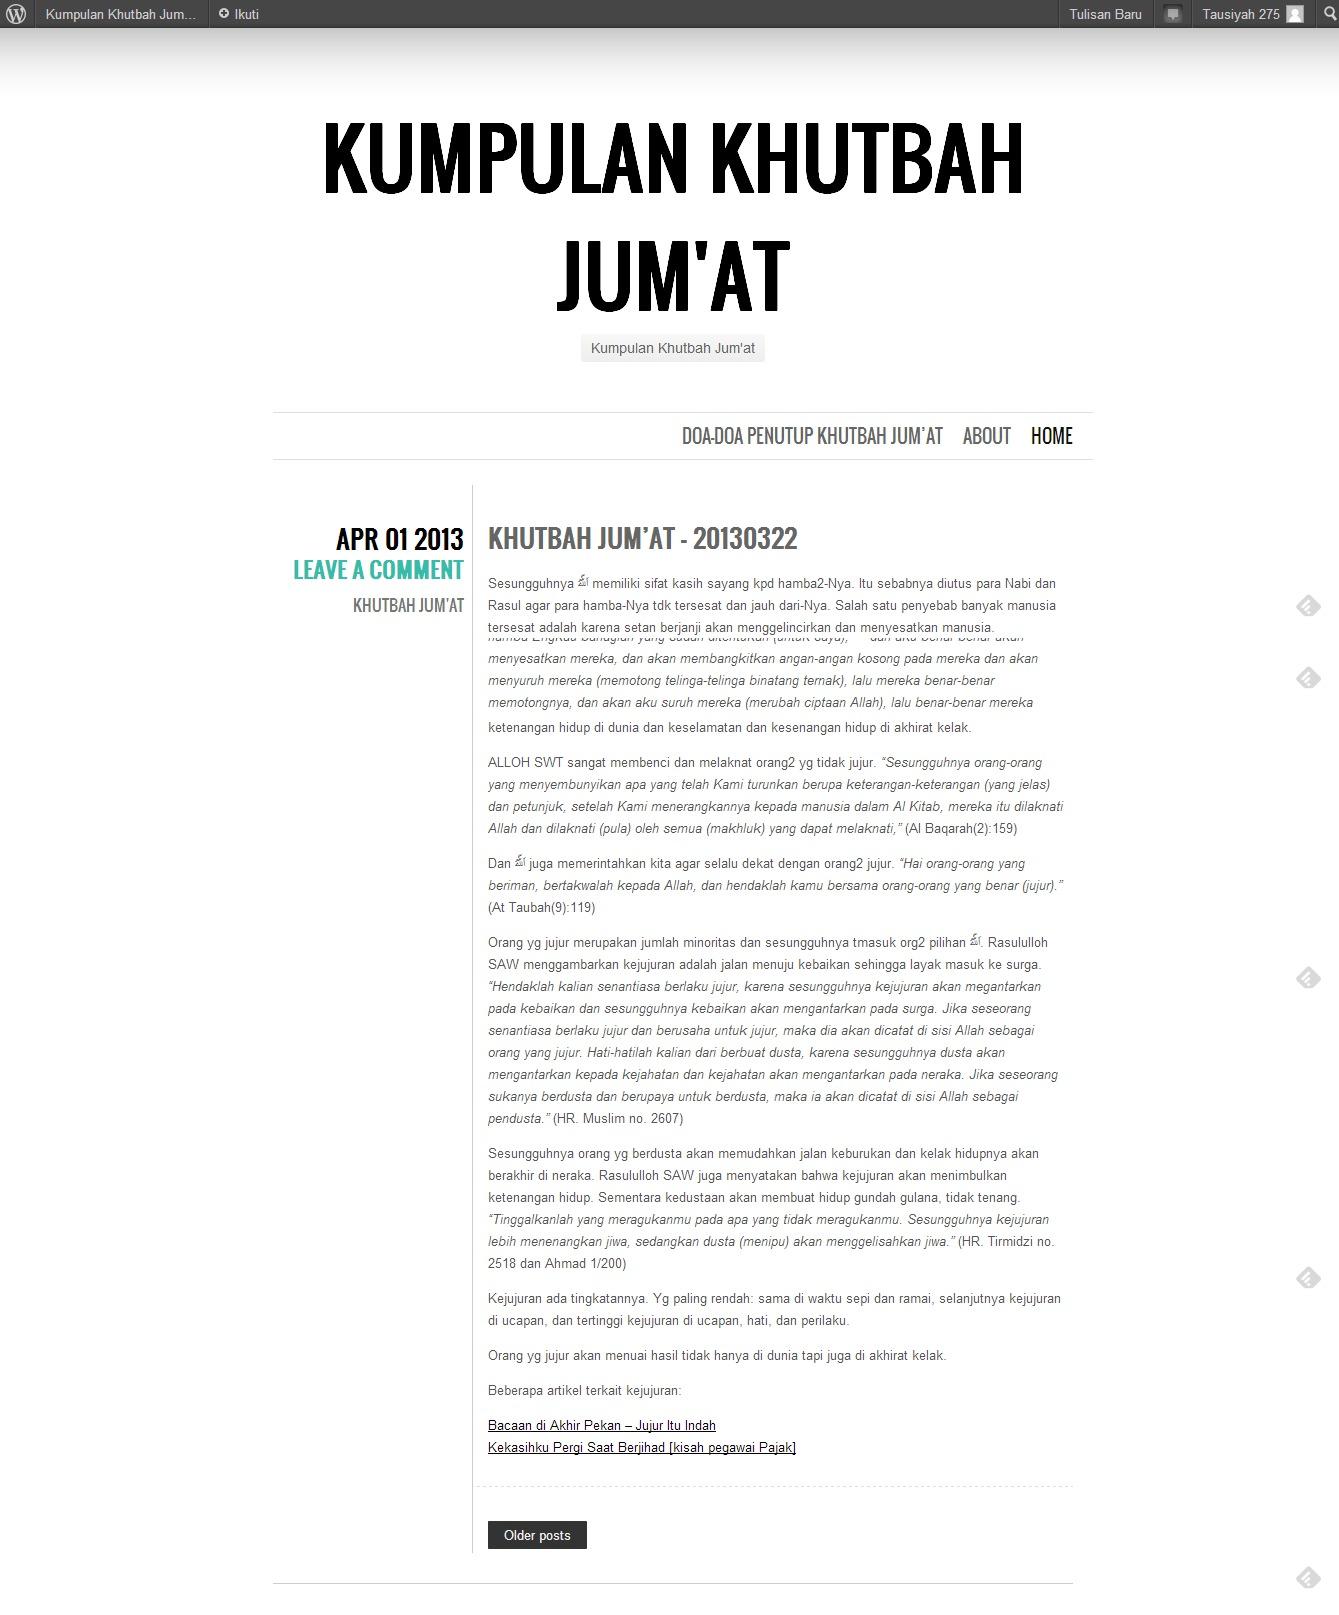 Contoh Khutbah Bahasa Sunda : contoh, khutbah, bahasa, sunda, Khutbah, Jumat, Bahasa, Sunda, Singkat, Fasrfoto